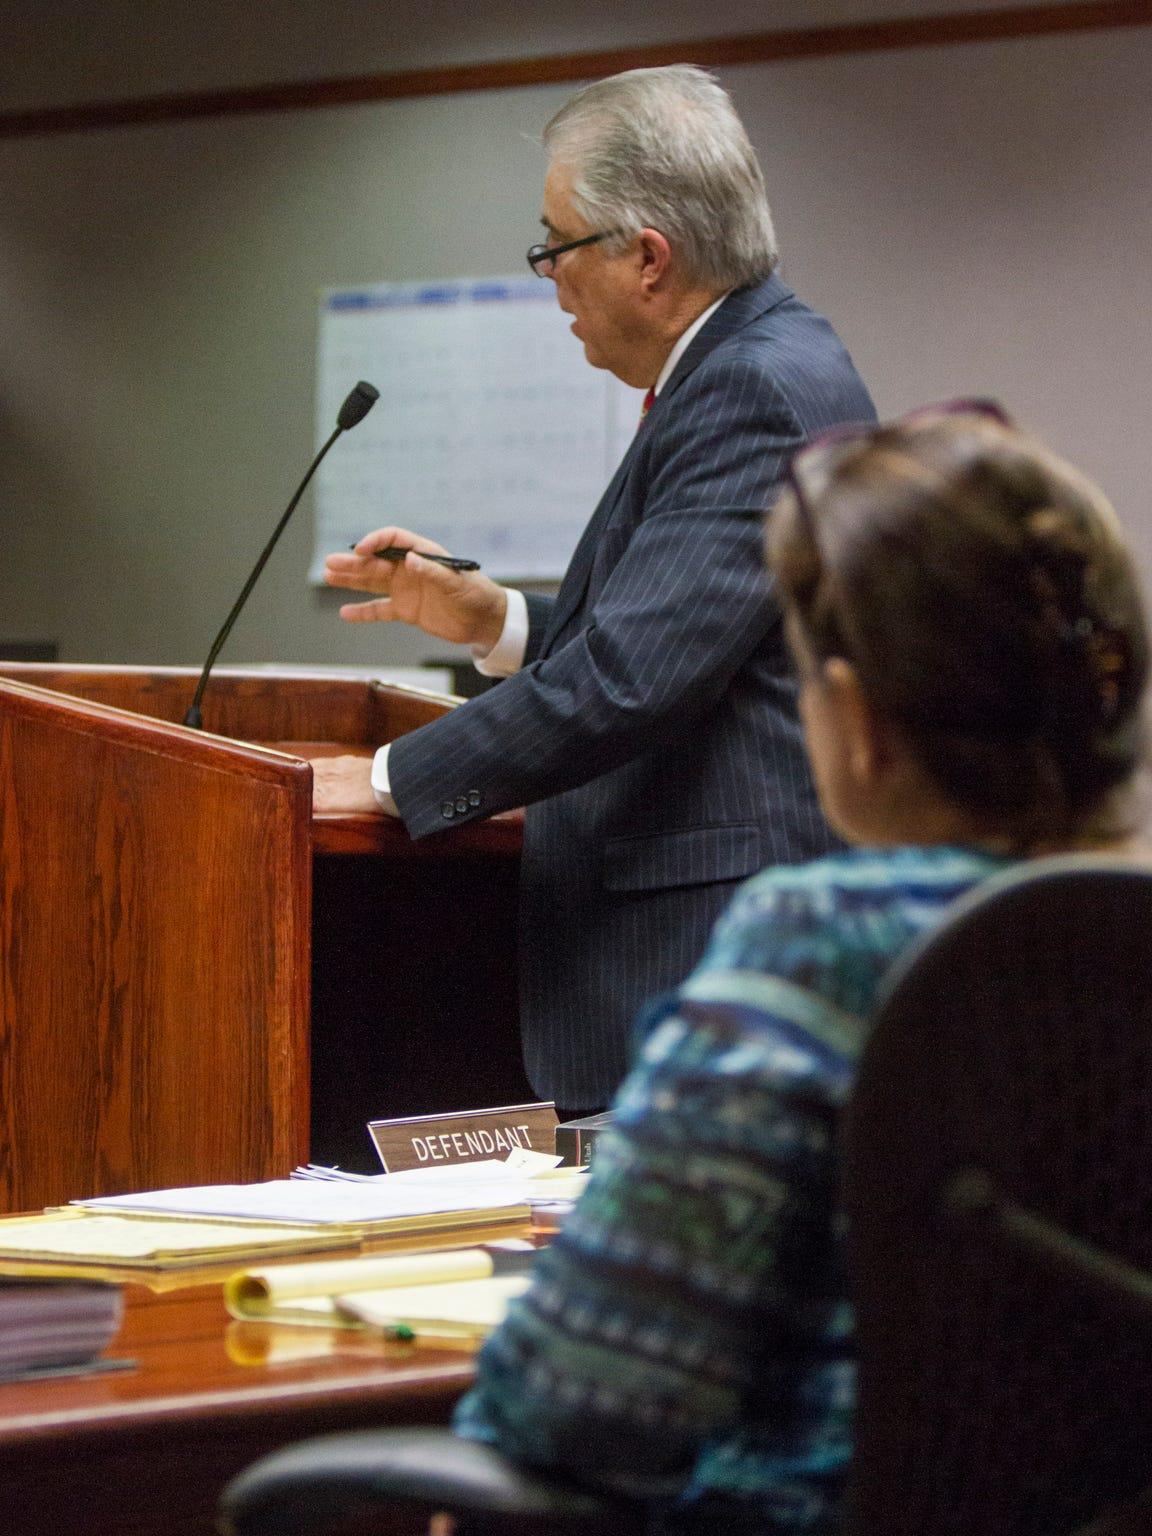 Douglas Terry, Vickie Sorensen's defense attorney,